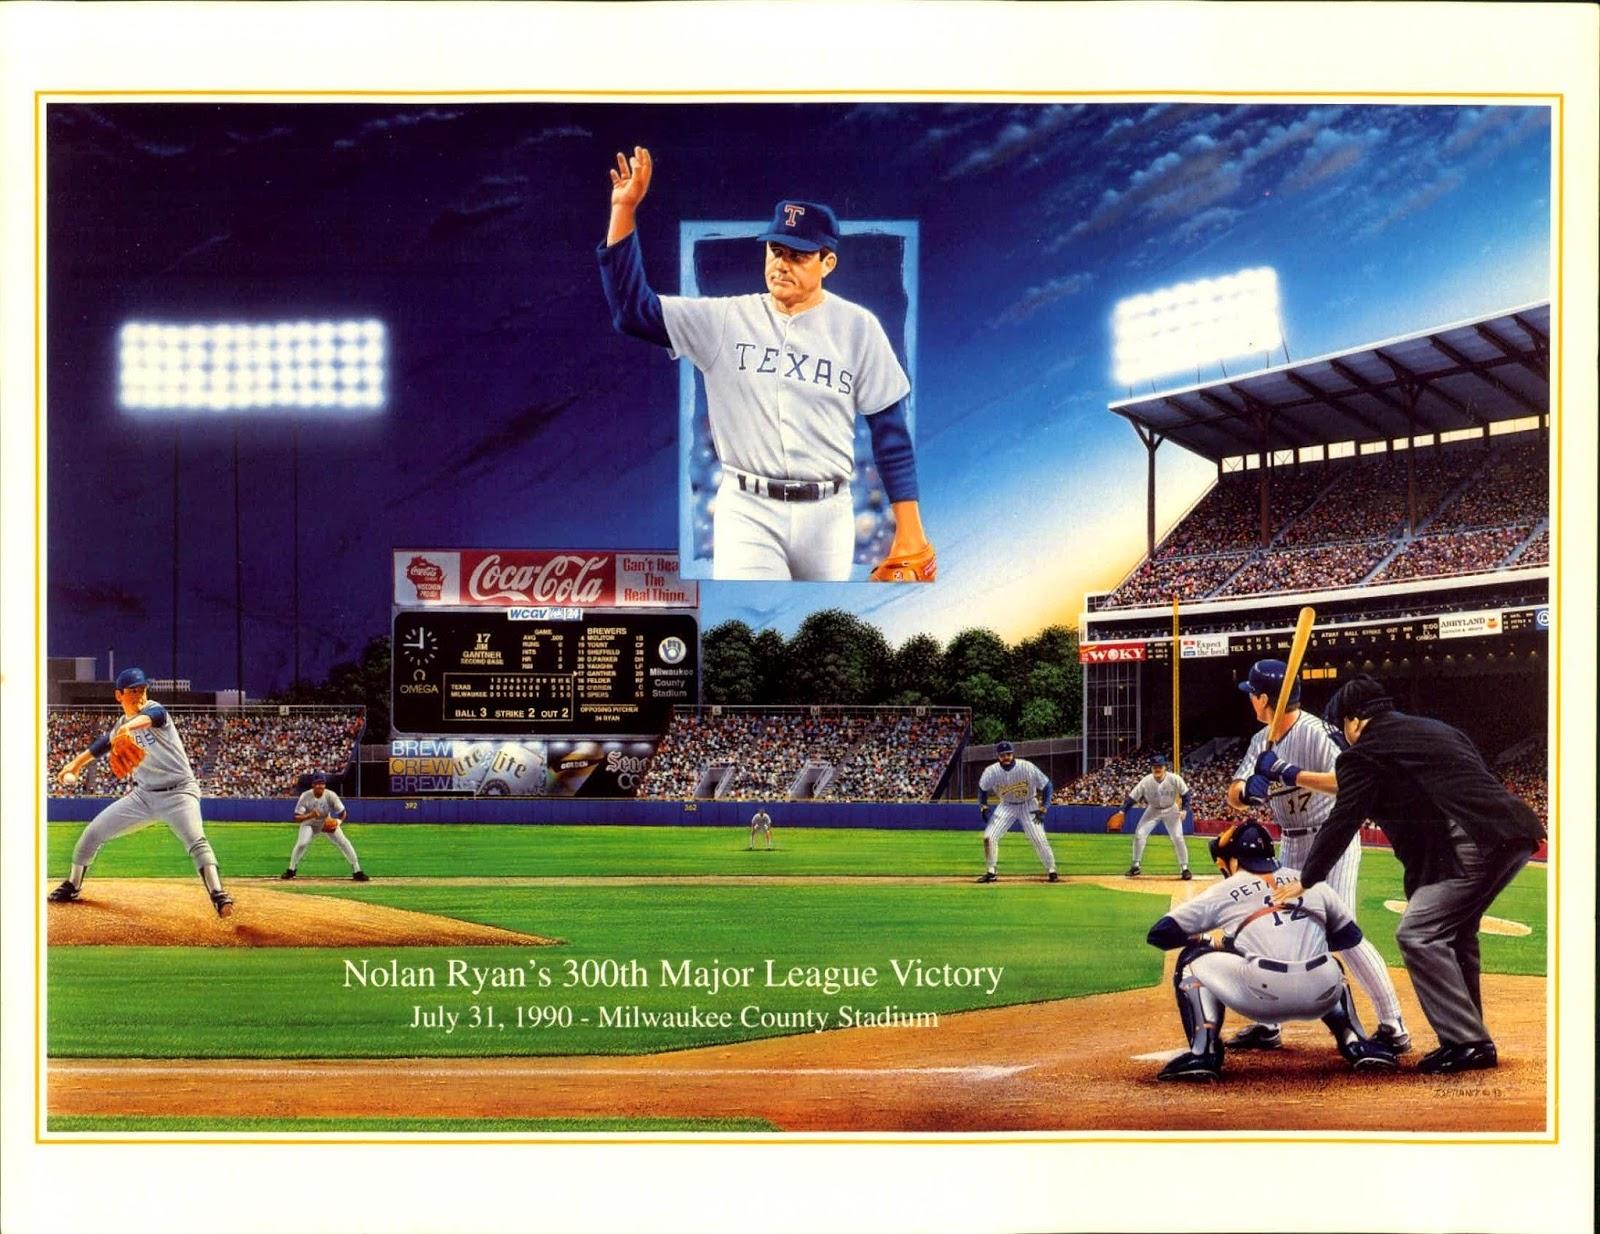 Baseball Sisco Kid Style Nolan Ryan Wins His 300th Game